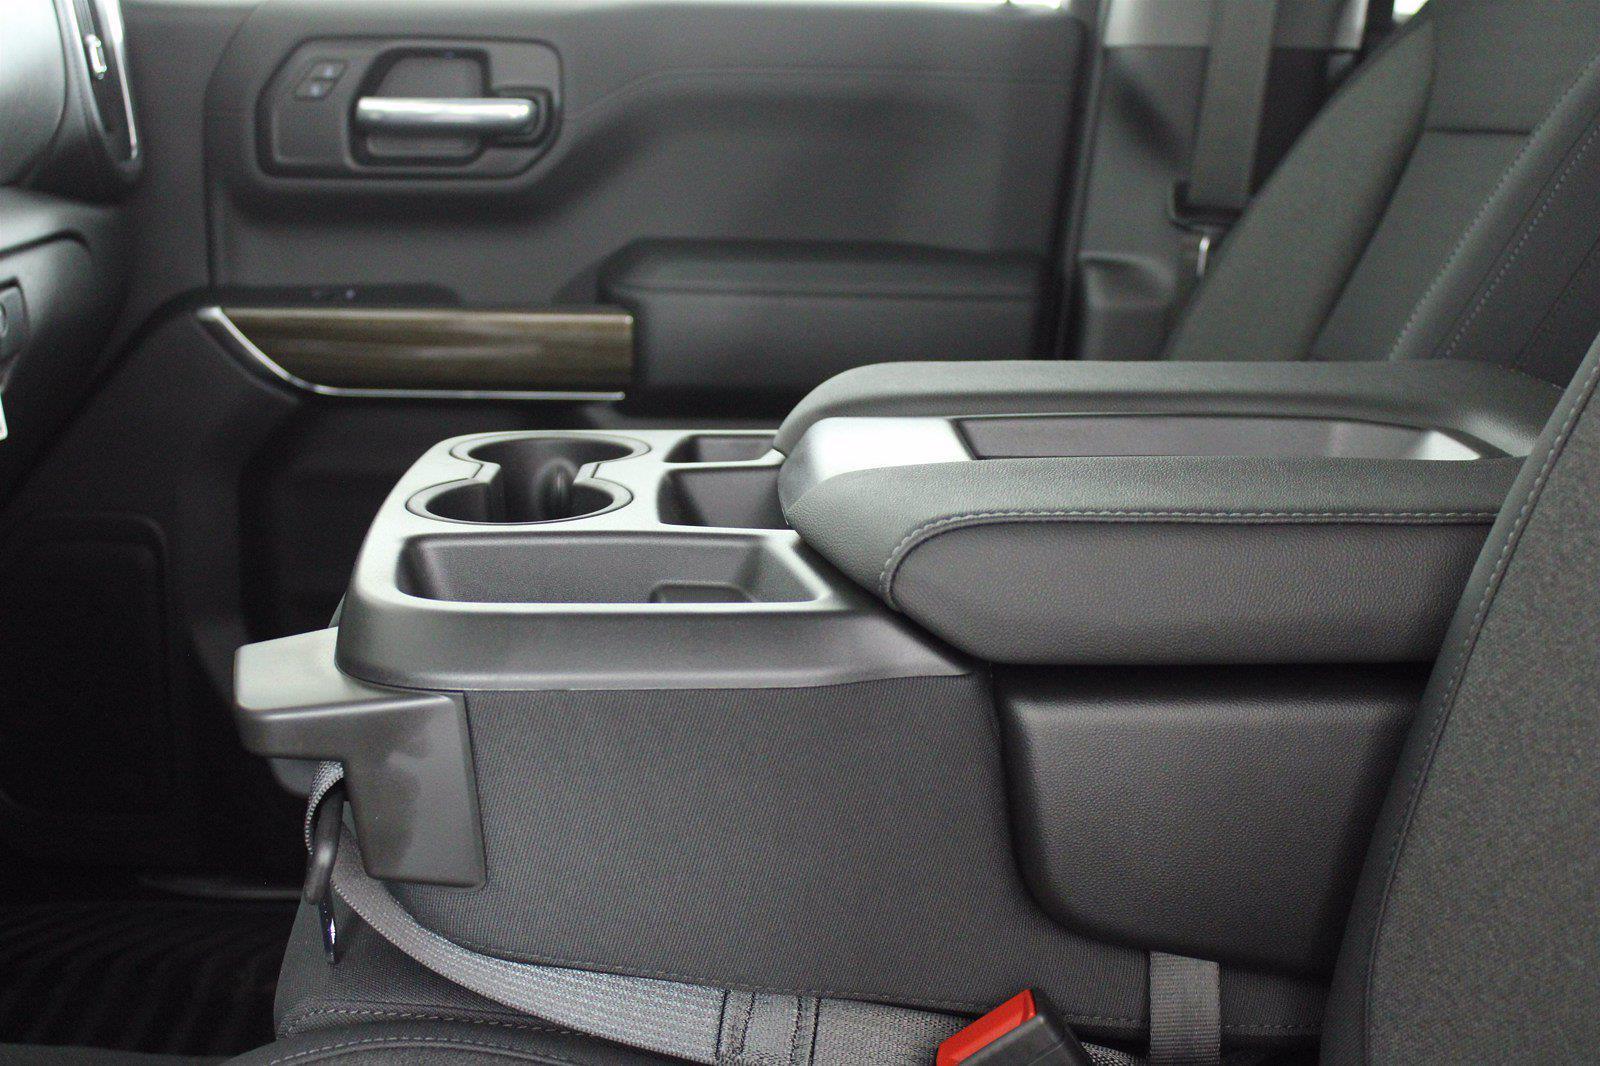 2021 Chevrolet Silverado 1500 Crew Cab 4x4, Pickup #D111135 - photo 13